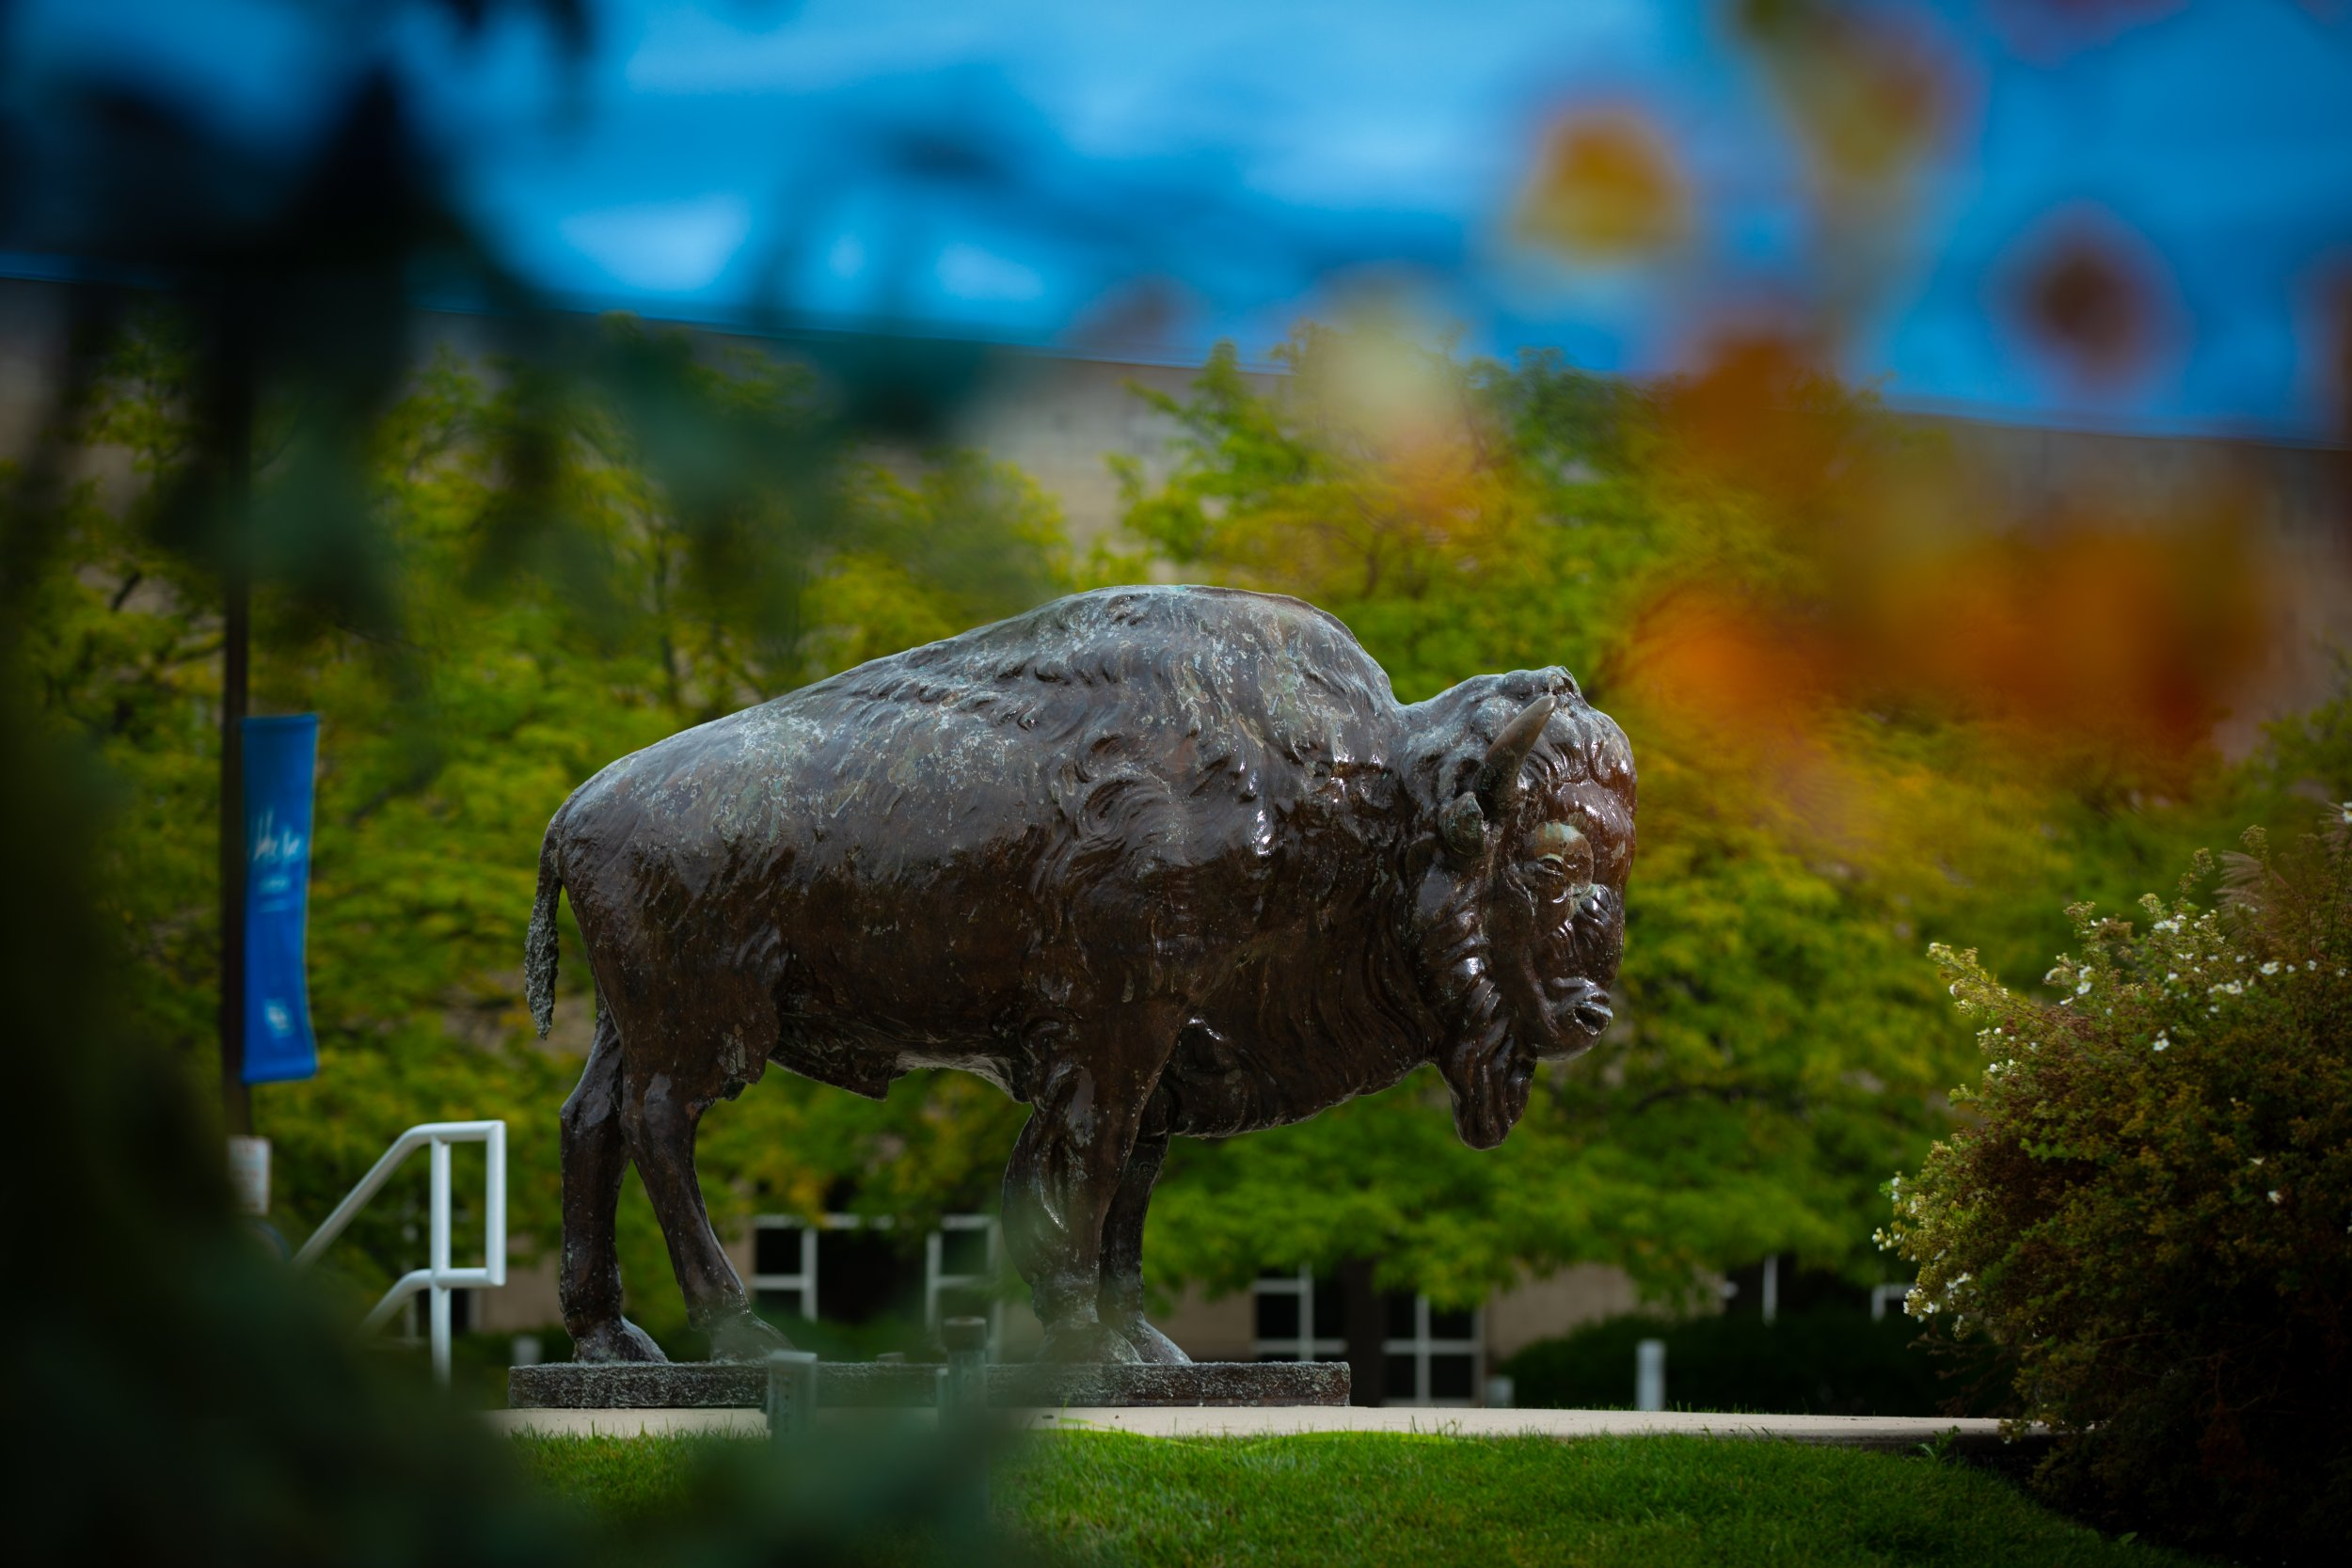 university at buffalo student died Sebastian Serafin-Bazan